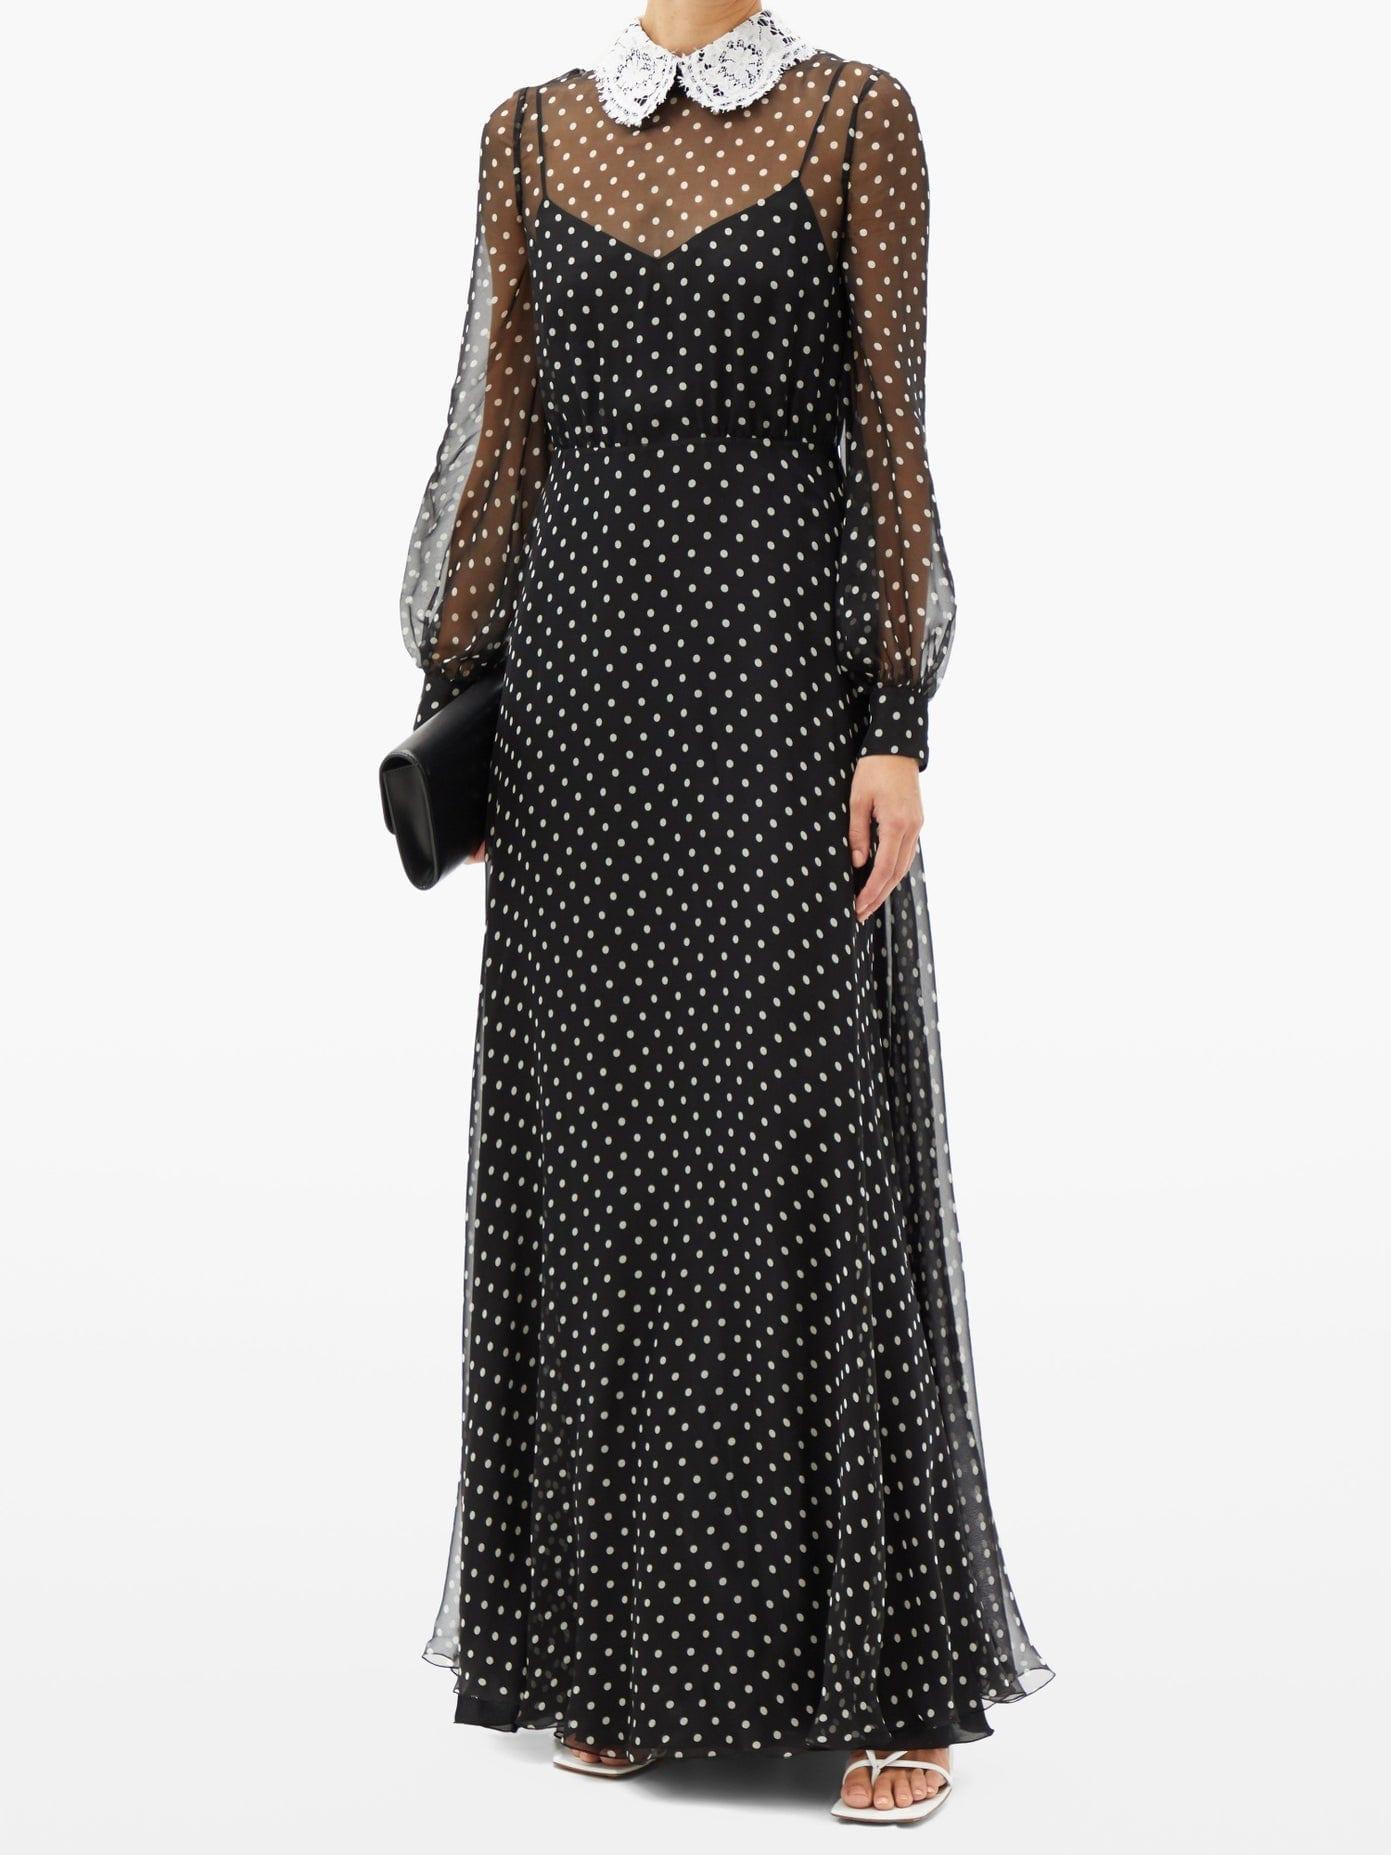 VALENTINO Lace-collar Polka-dot Chiffon Gown